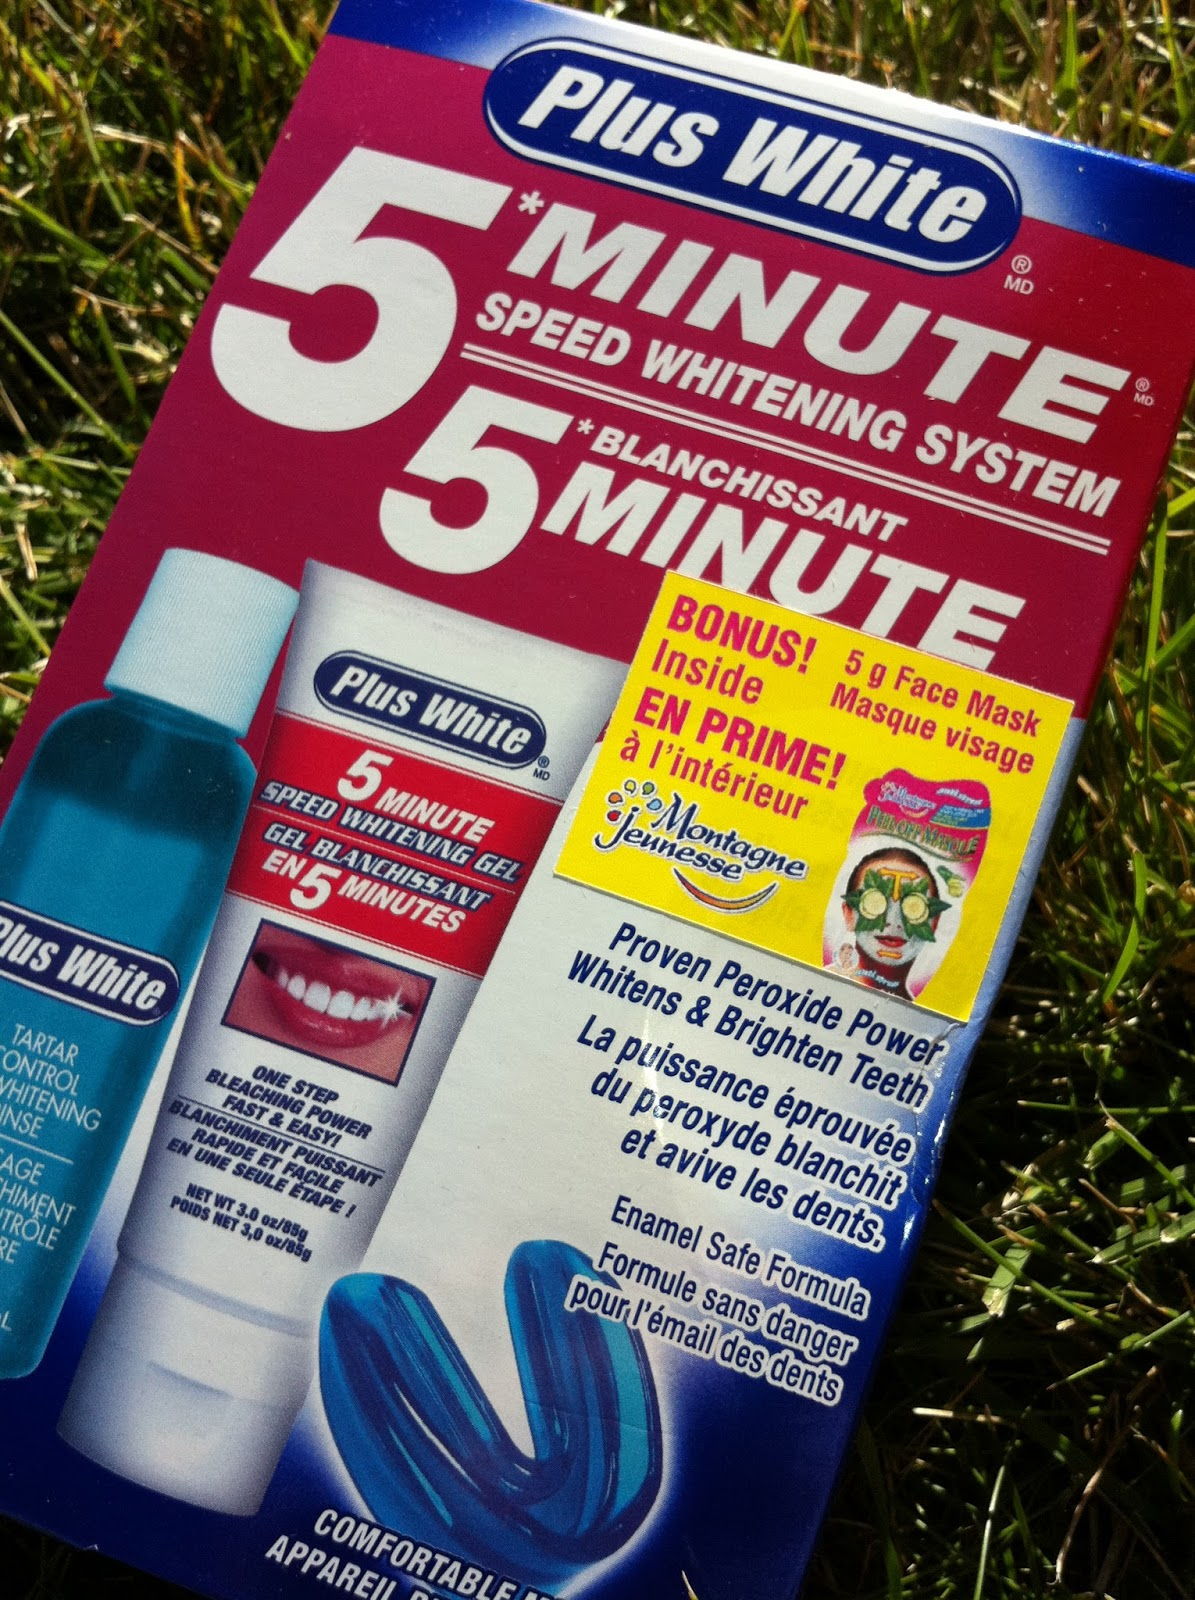 plus white 5 minute speed whitening system my blog spot